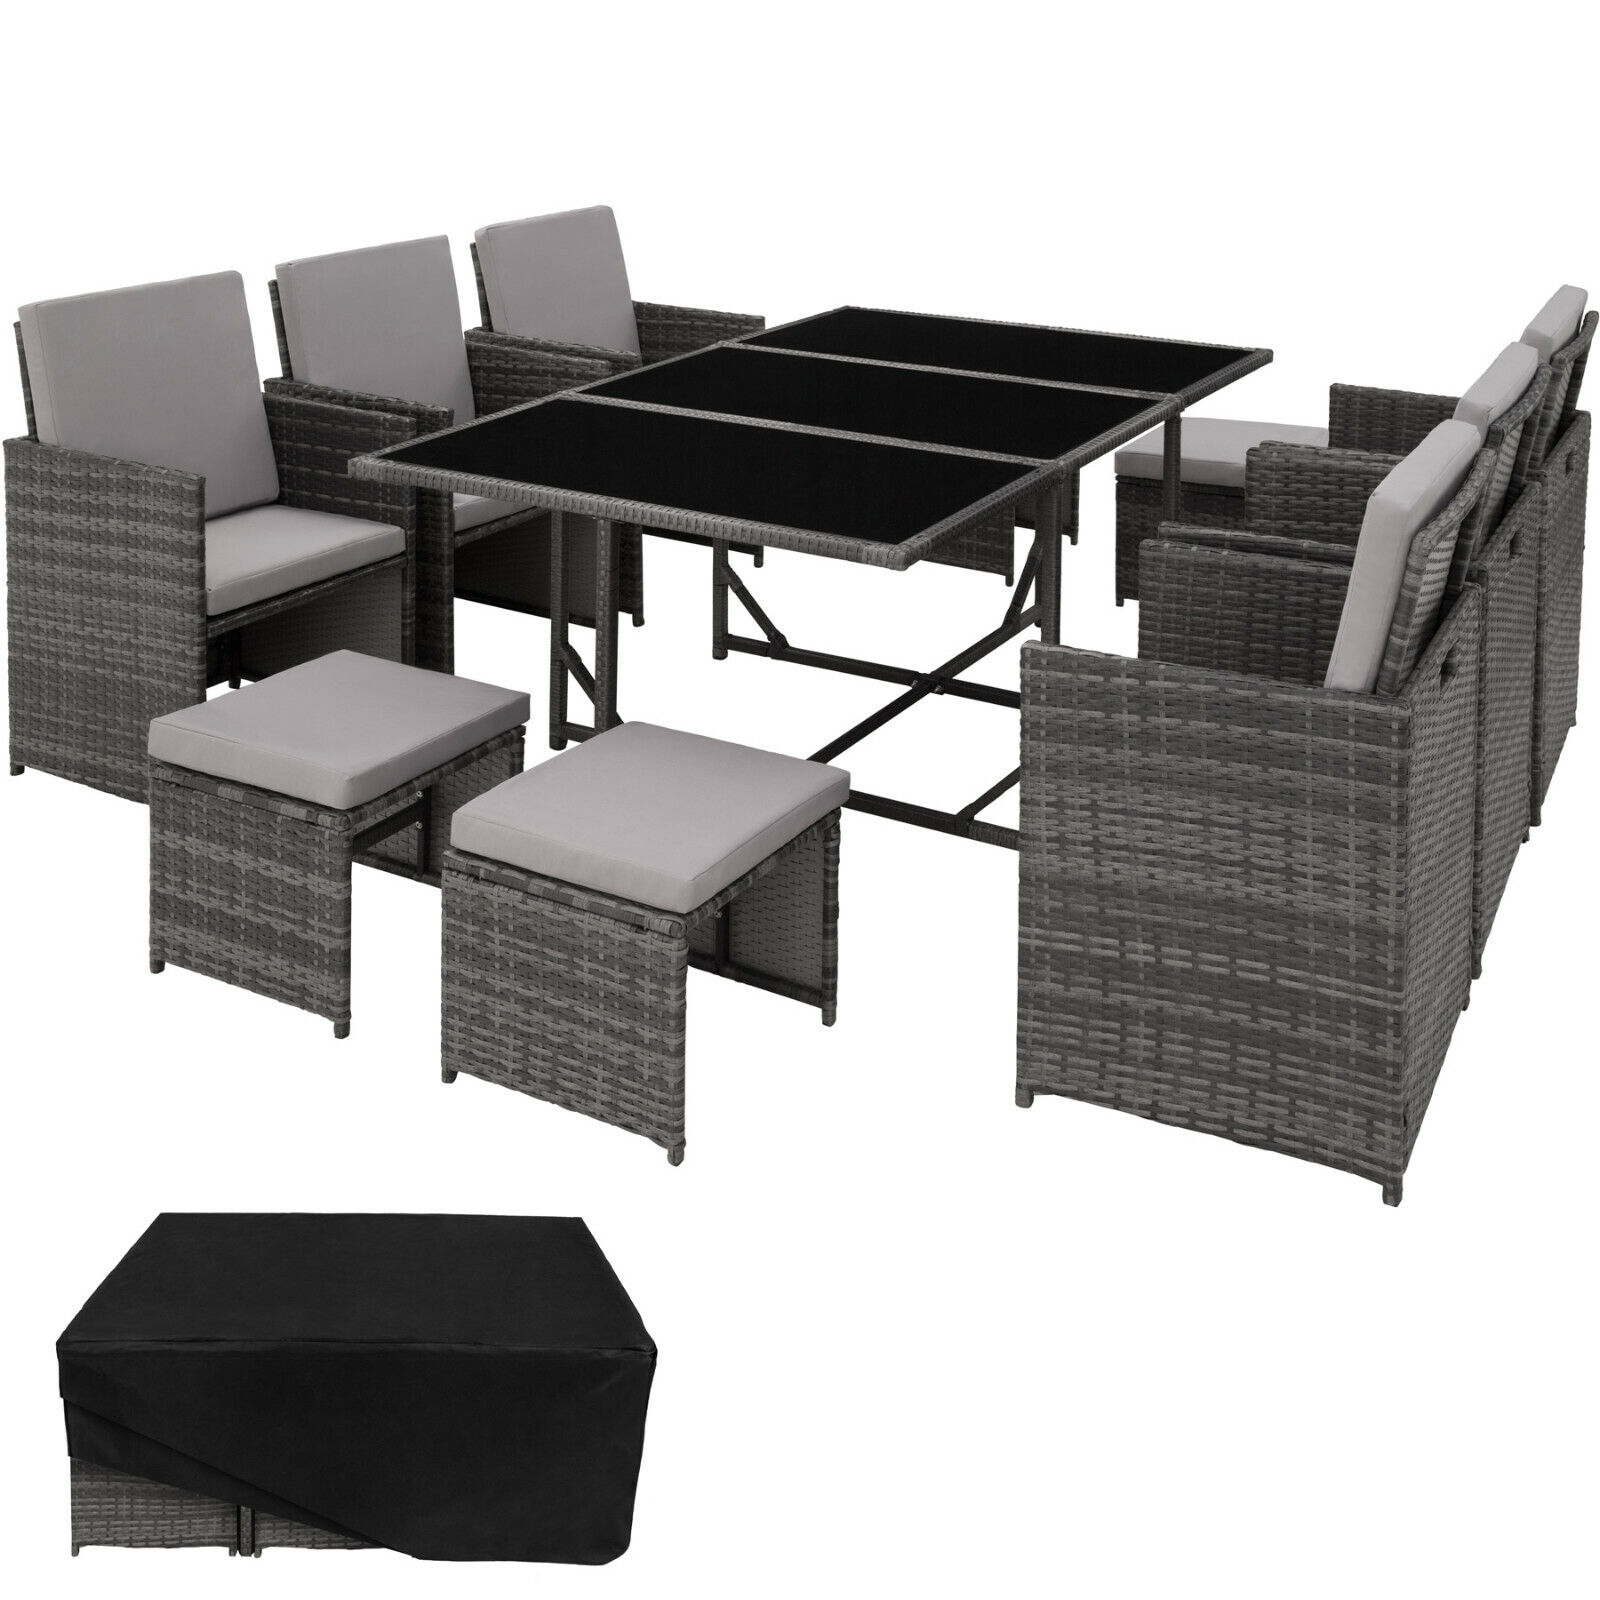 Poly Rattan Sitzgruppe Gartenmöbel Garten Lounge 6x Stuhl Tisch 4x Hocker grau